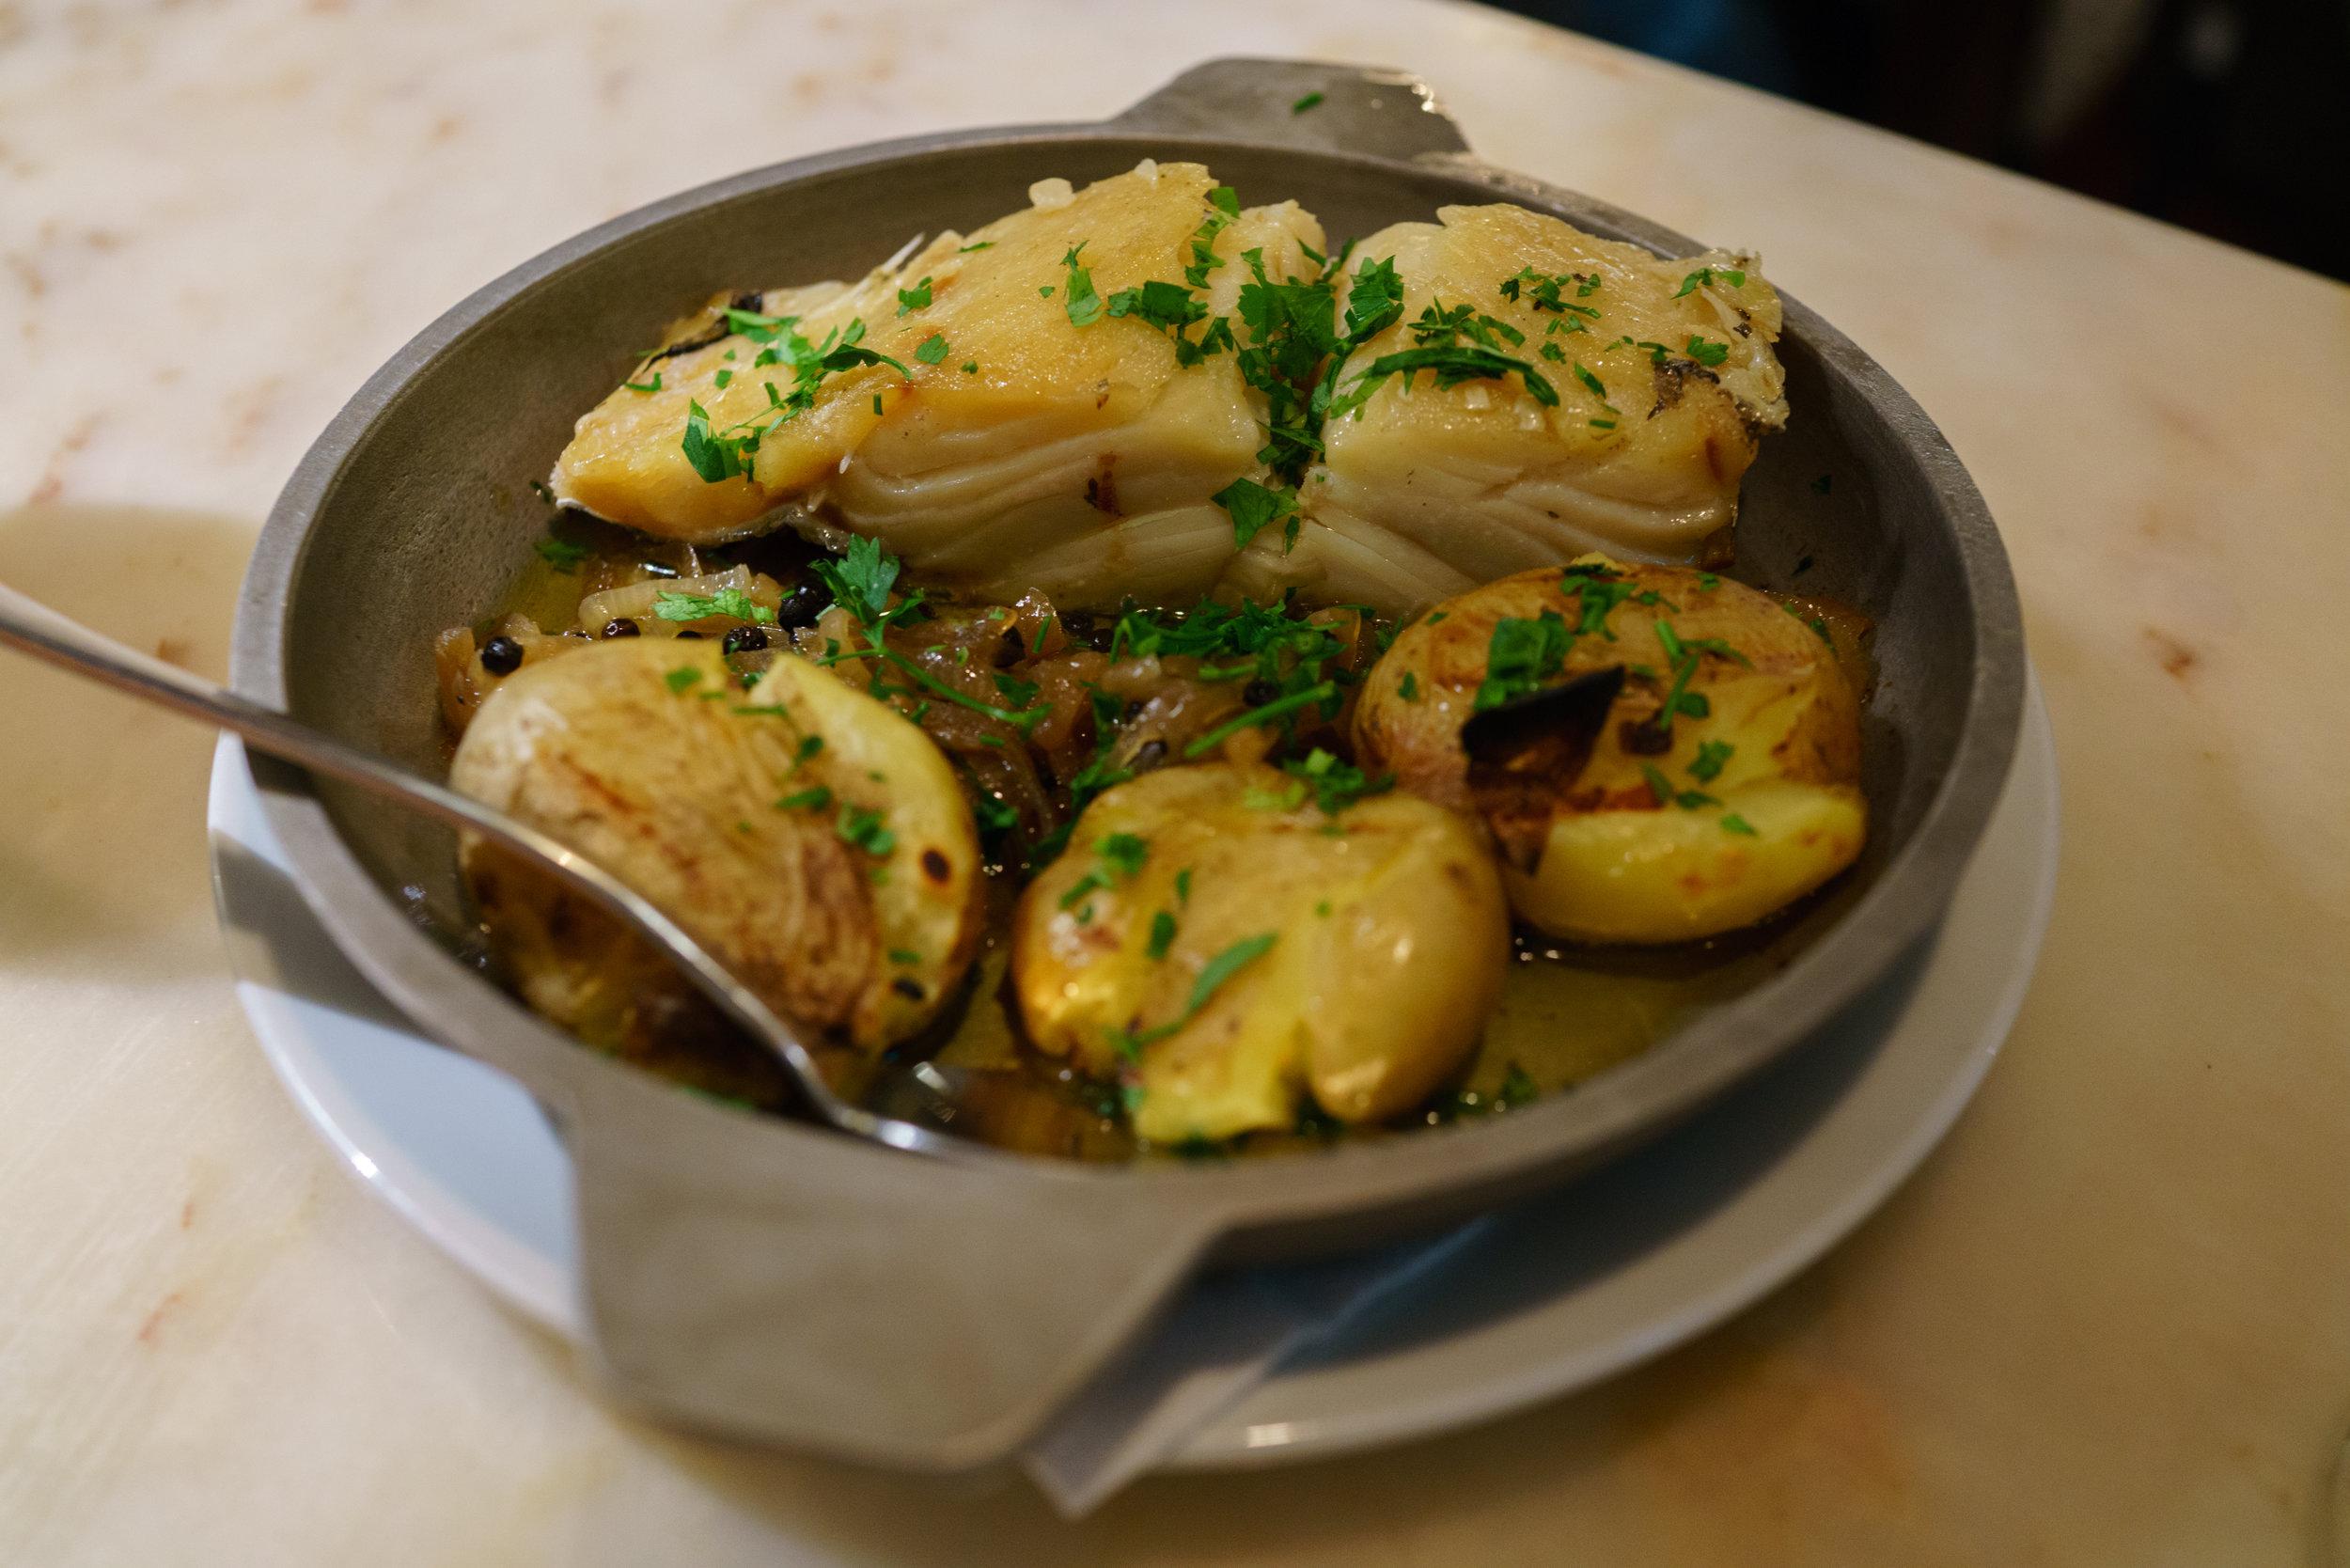 Bacalhau , or salted cod, a Portuguese staple